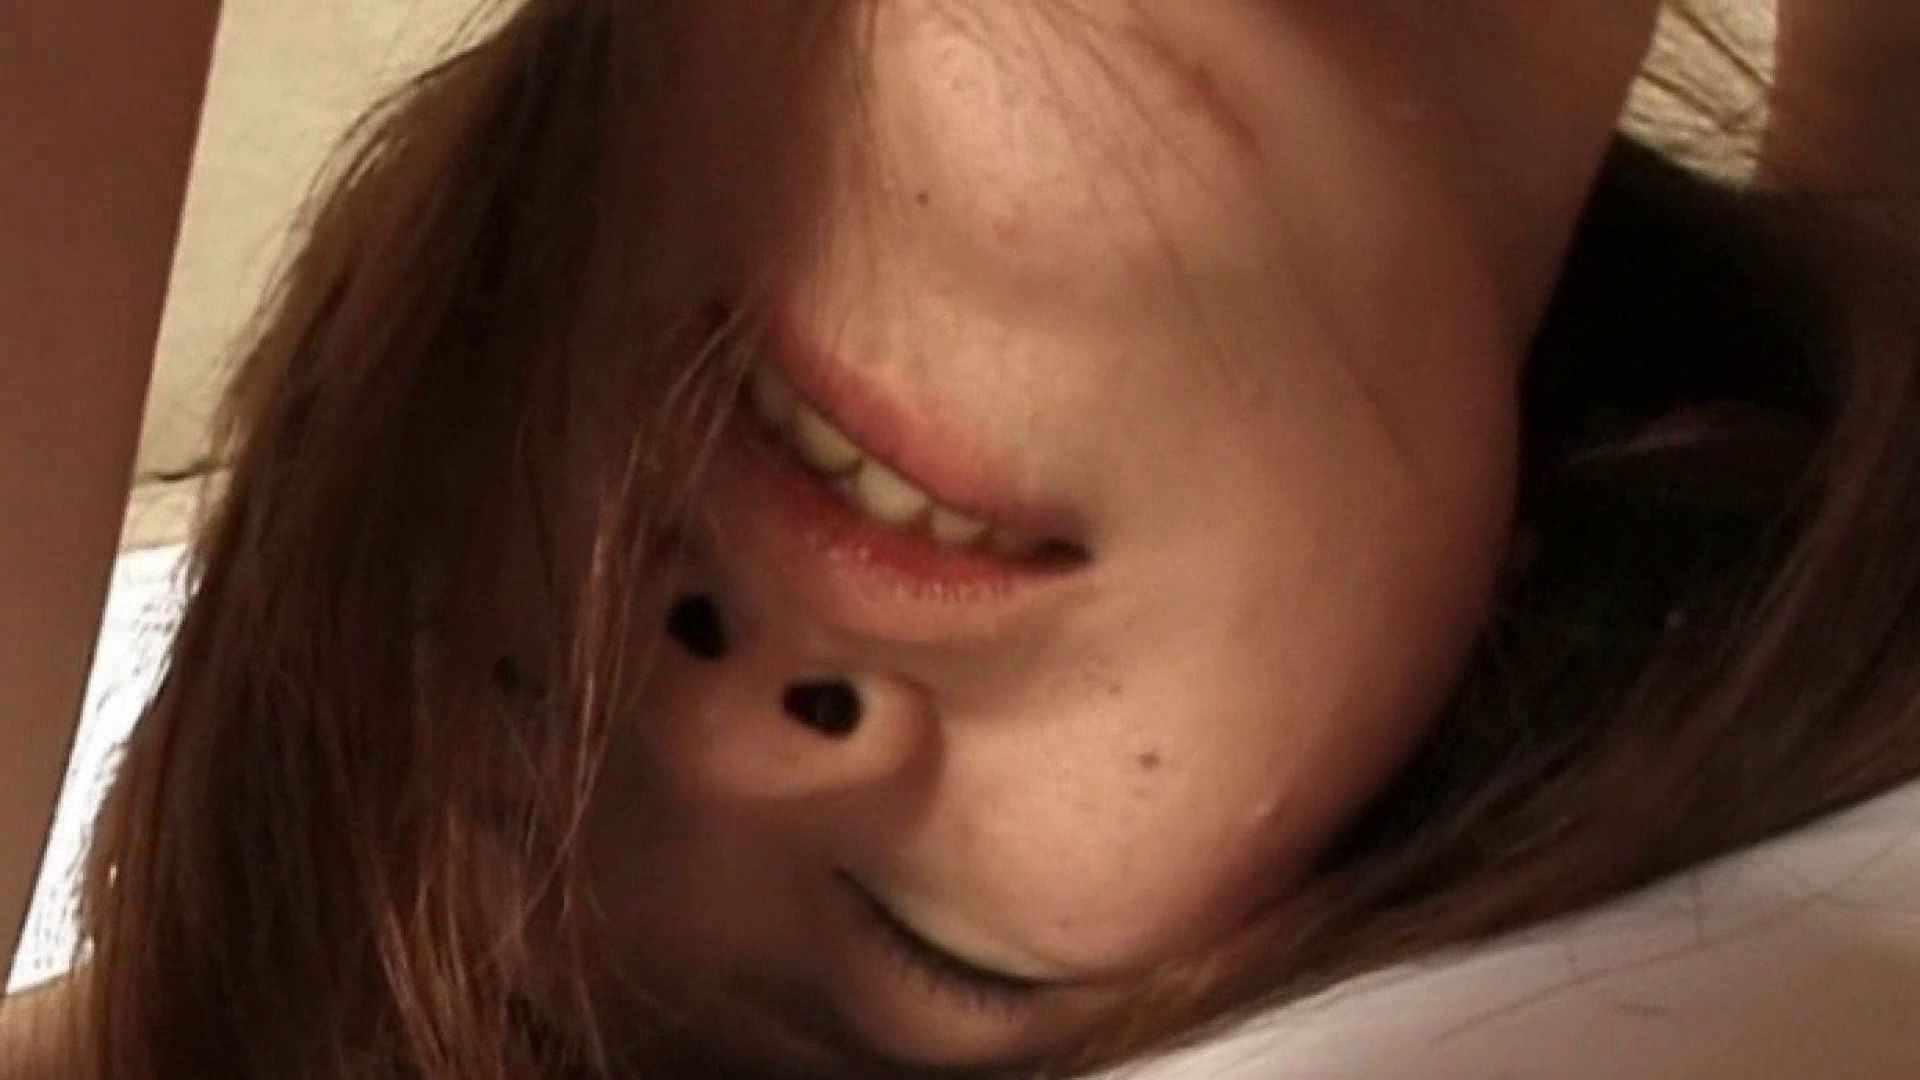 S級厳選美女ビッチガールVol.53 美しいOLの裸体 オメコ動画キャプチャ 100pic 71